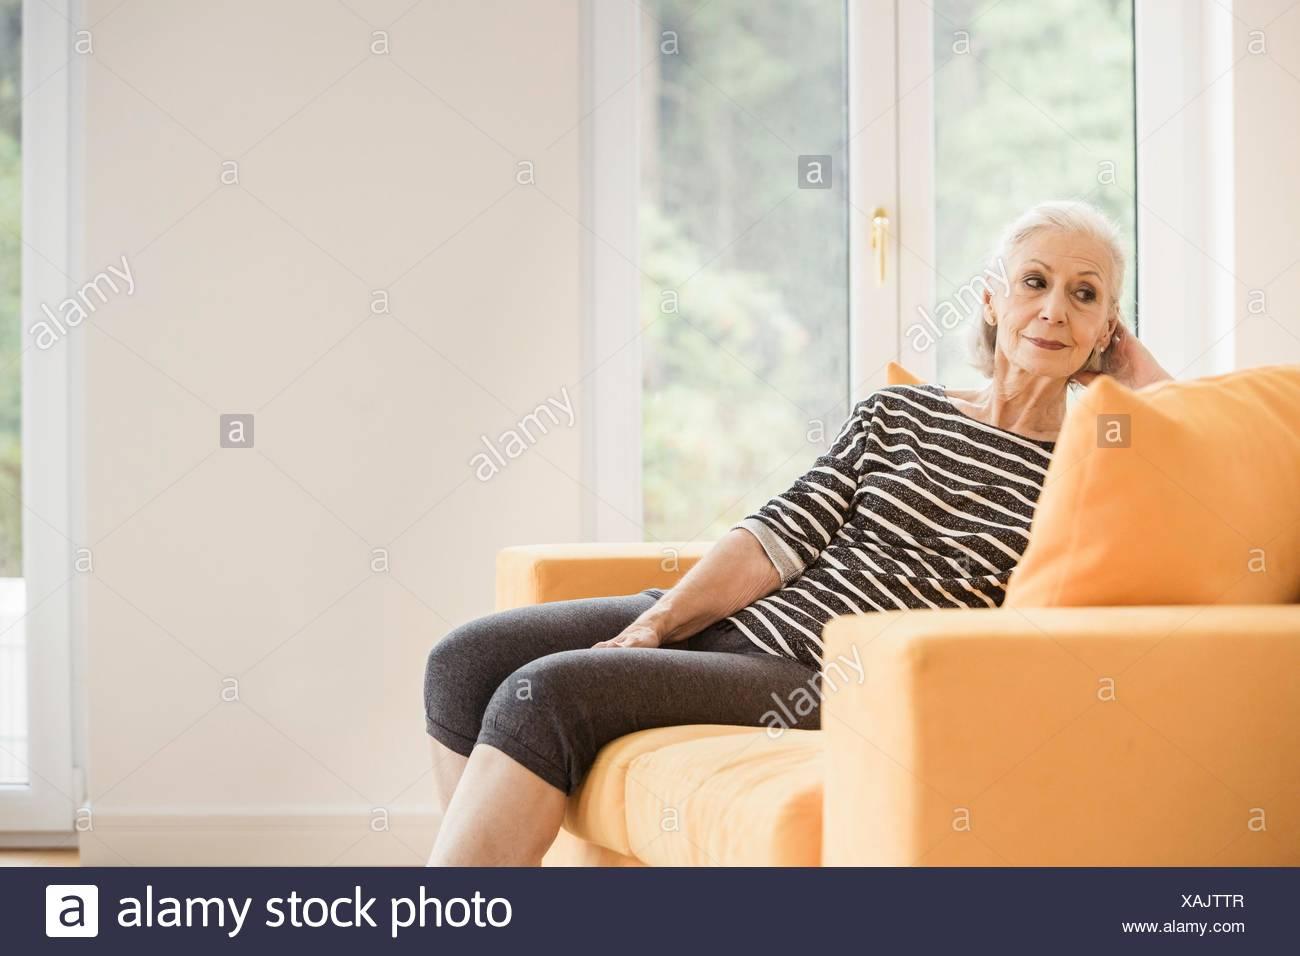 Senior woman taking a break from exercising on living room sofa - Stock Image